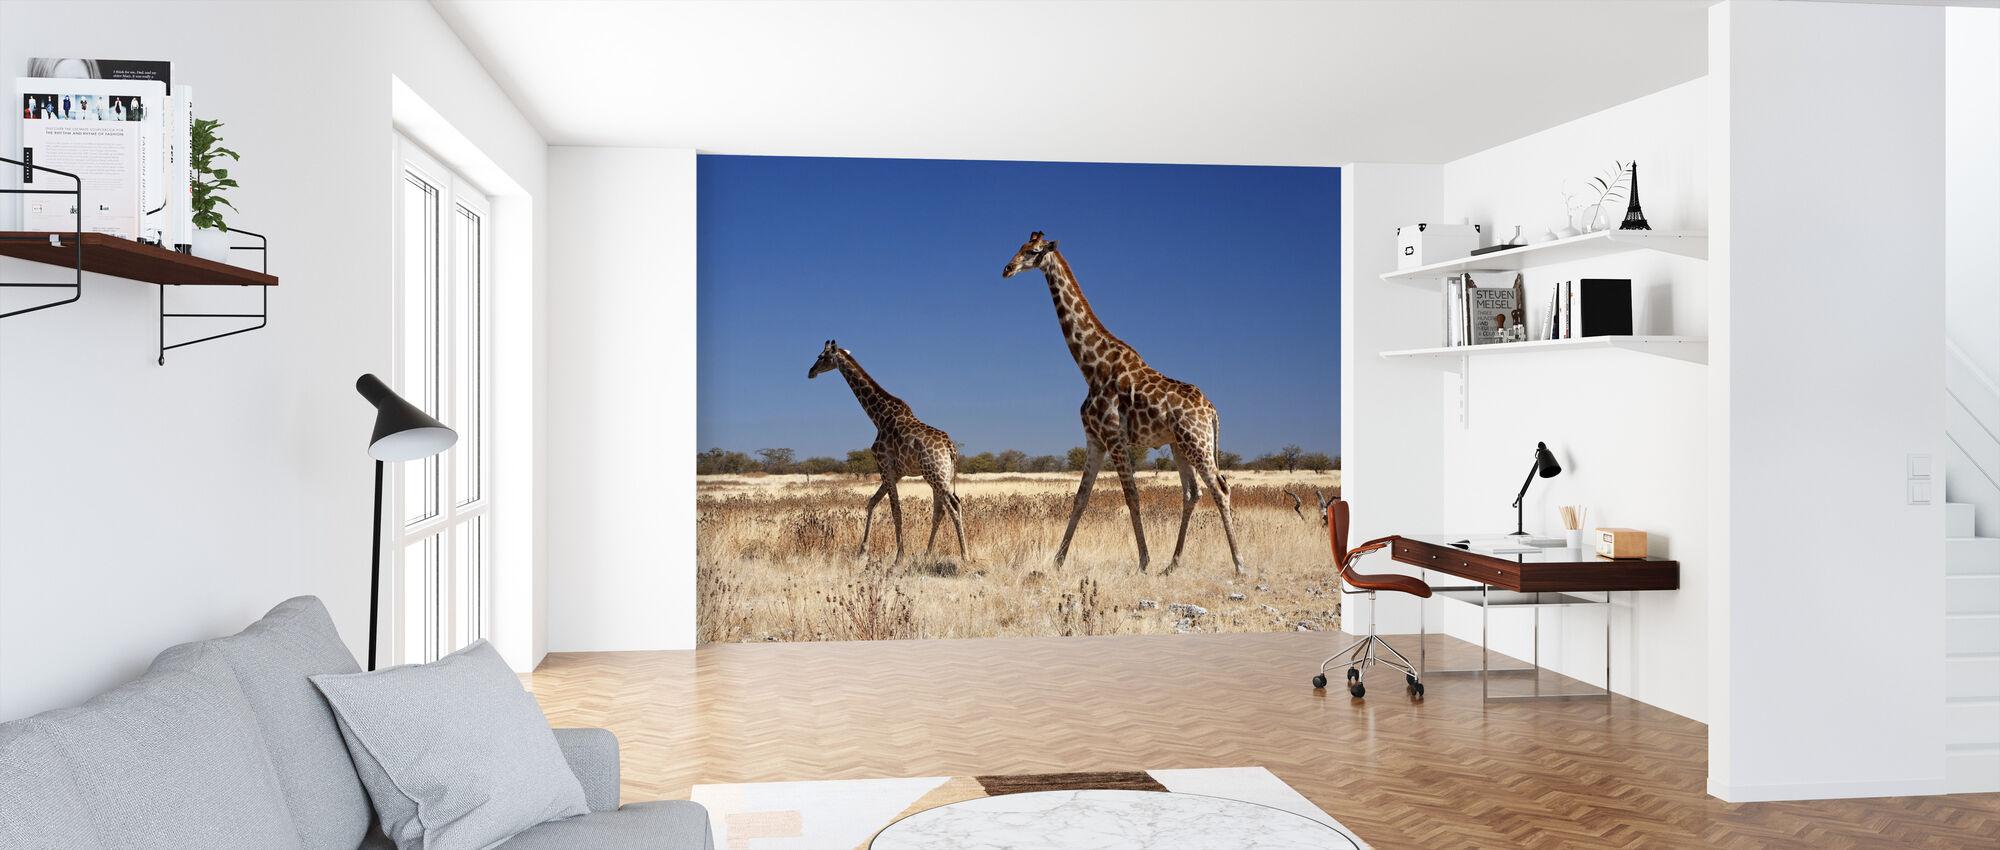 Giraffes at Etosha National Park - Wallpaper - Office